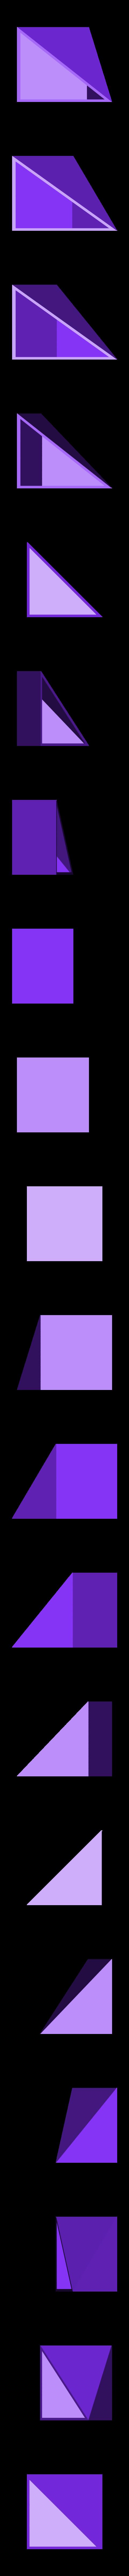 LiuHuiThird_VerC.stl Download free STL file Thirds Cube Dissection, Many Styles, Liu Hui • 3D printer template, LGBU